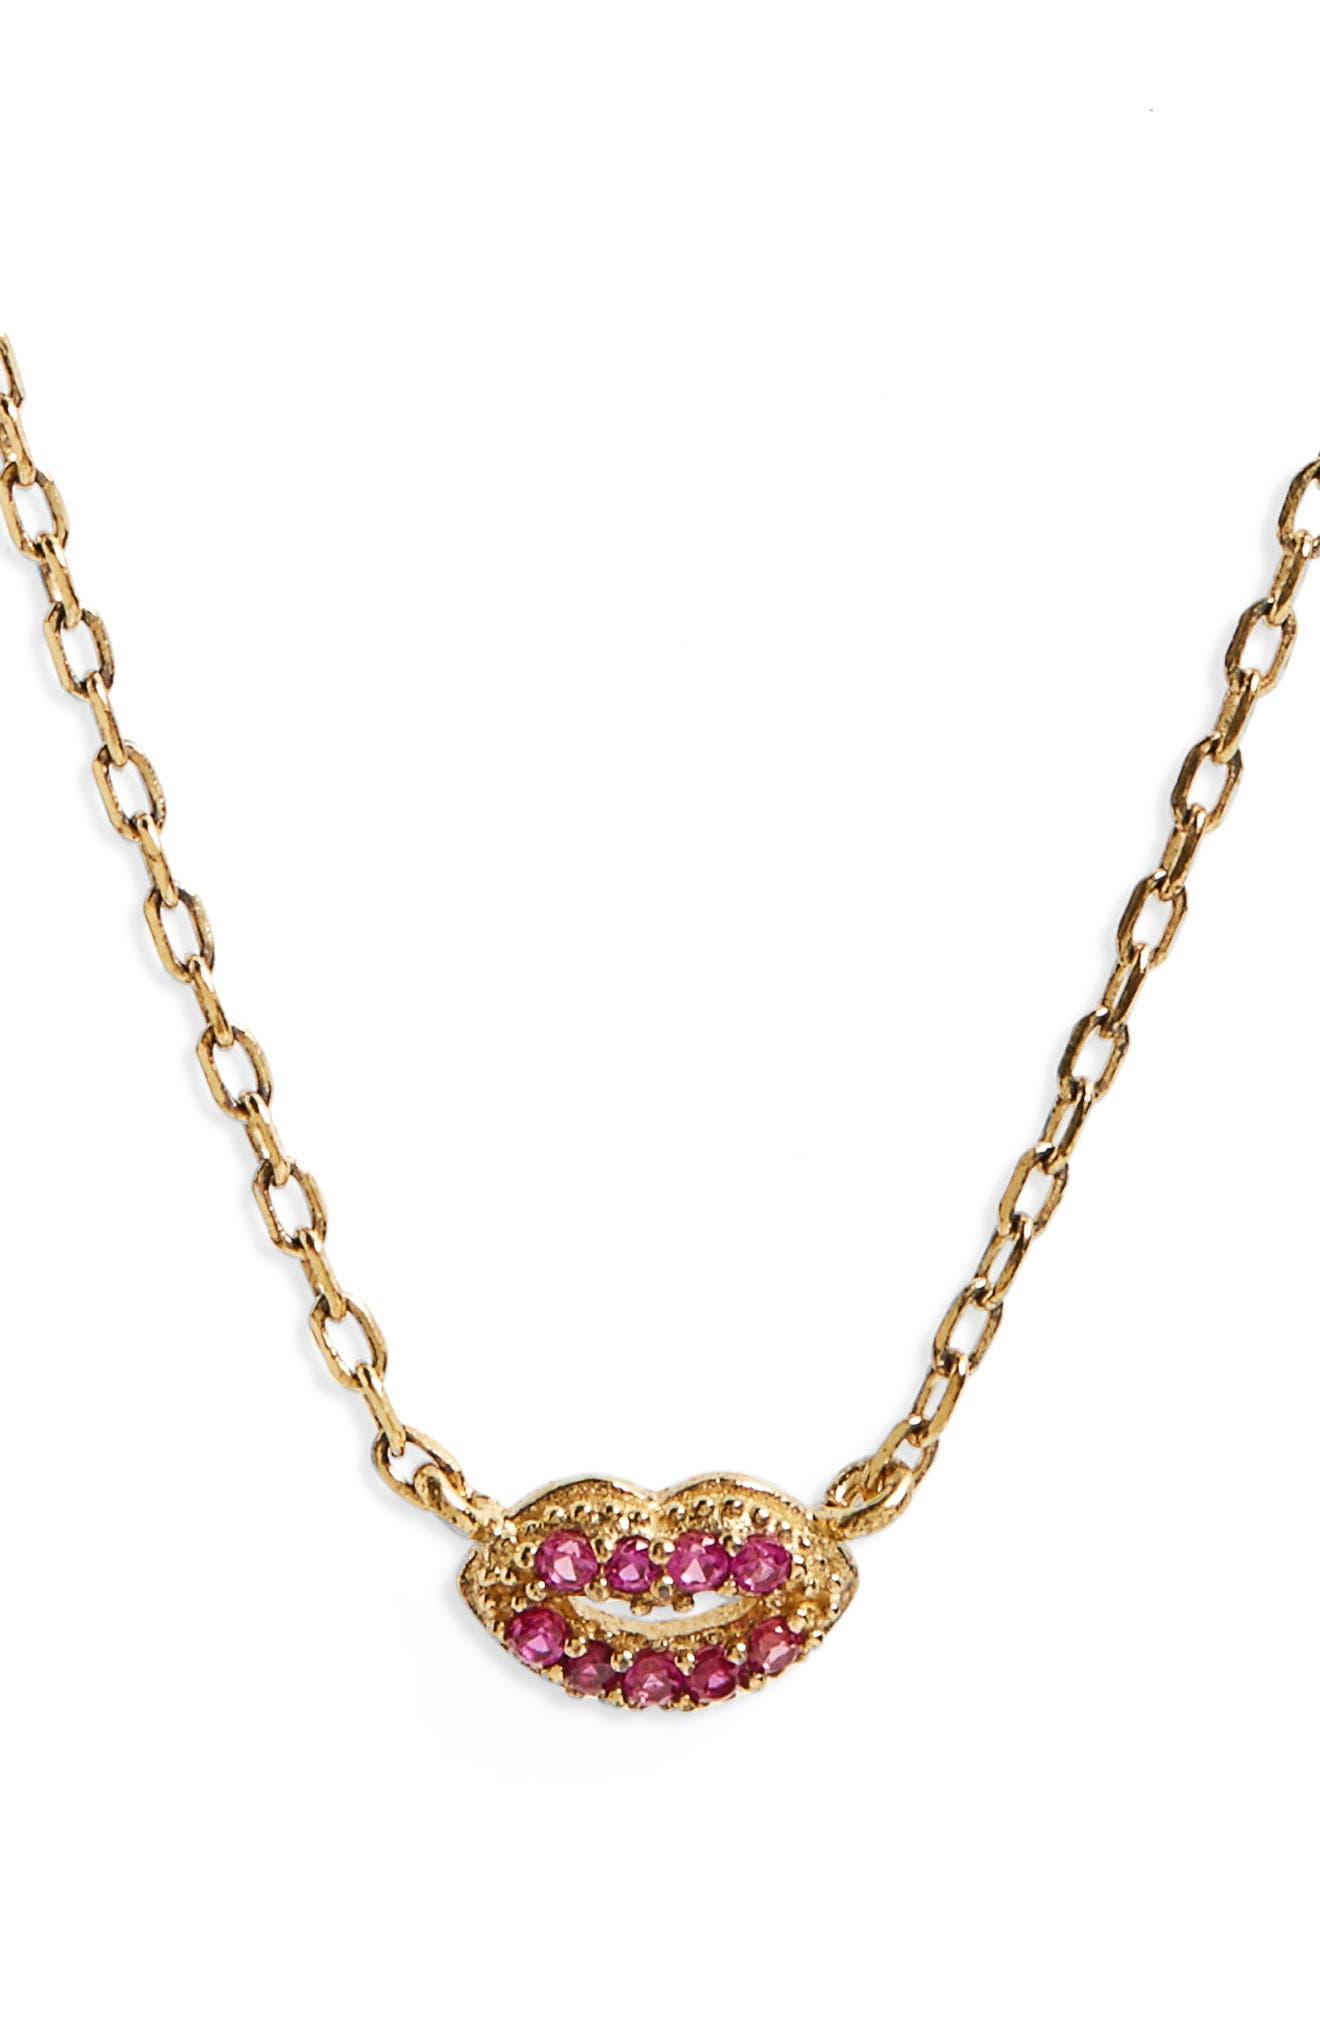 Main Image - MARC JACOBS Lips Pendant Necklace